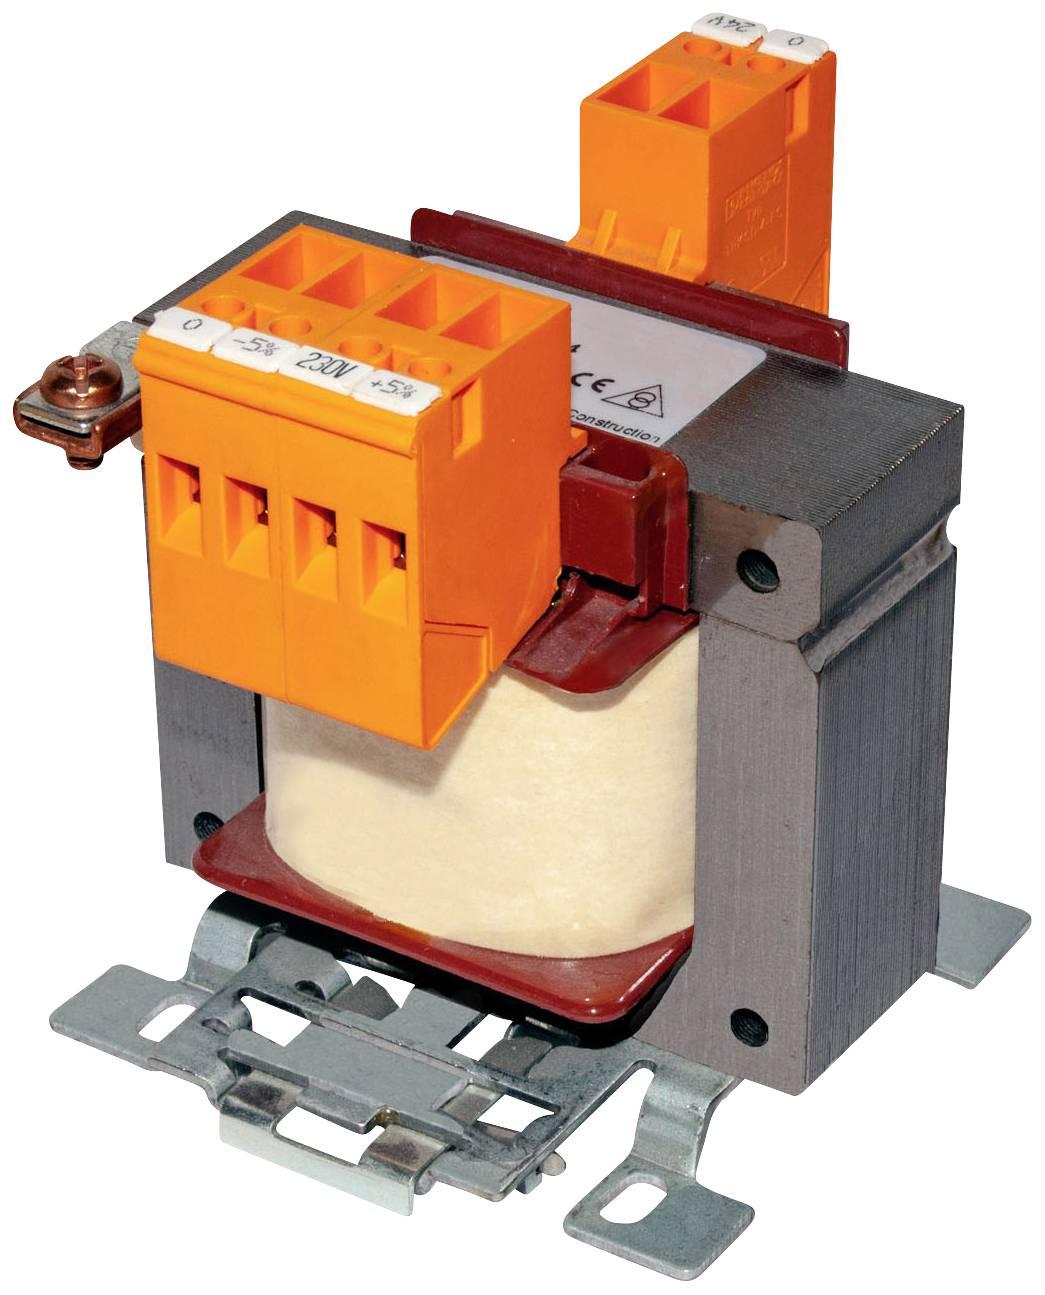 Riadiaci transformátor Weiss Elektrotechnik WUSTTR 160/1124, 160 VA